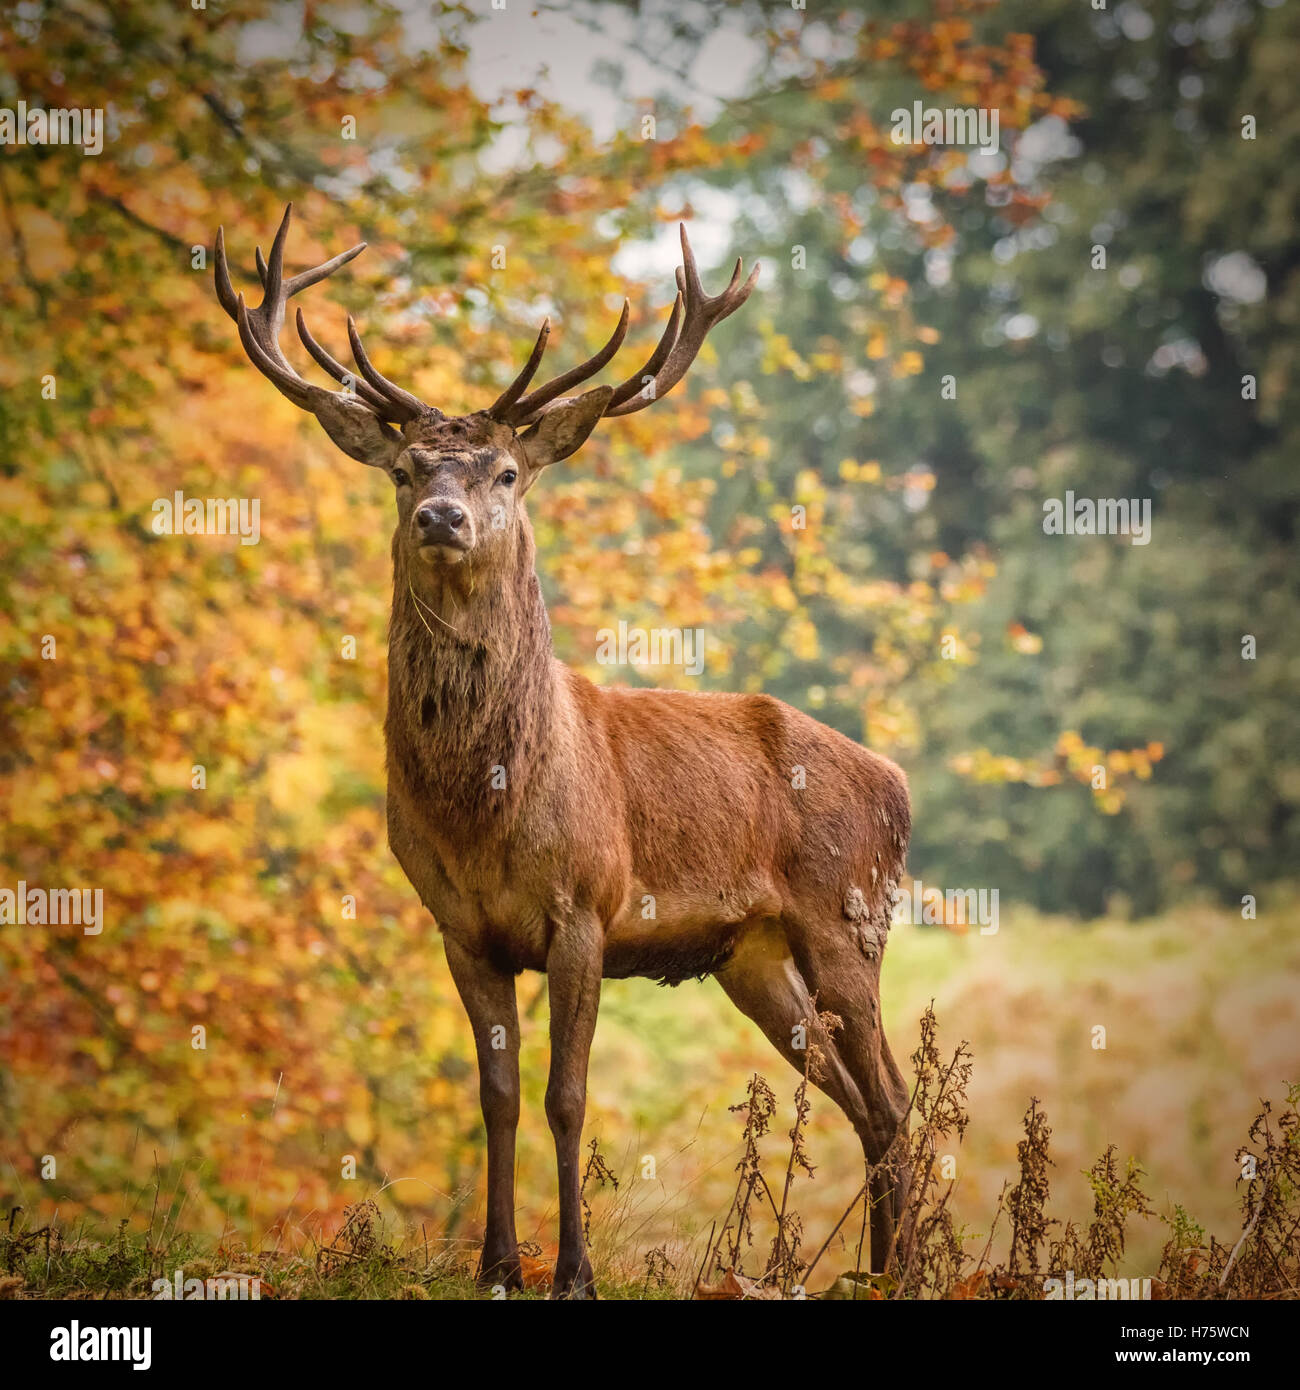 Red Deer Stag, Royal Studley Deer Park, Ripon Stock Photo